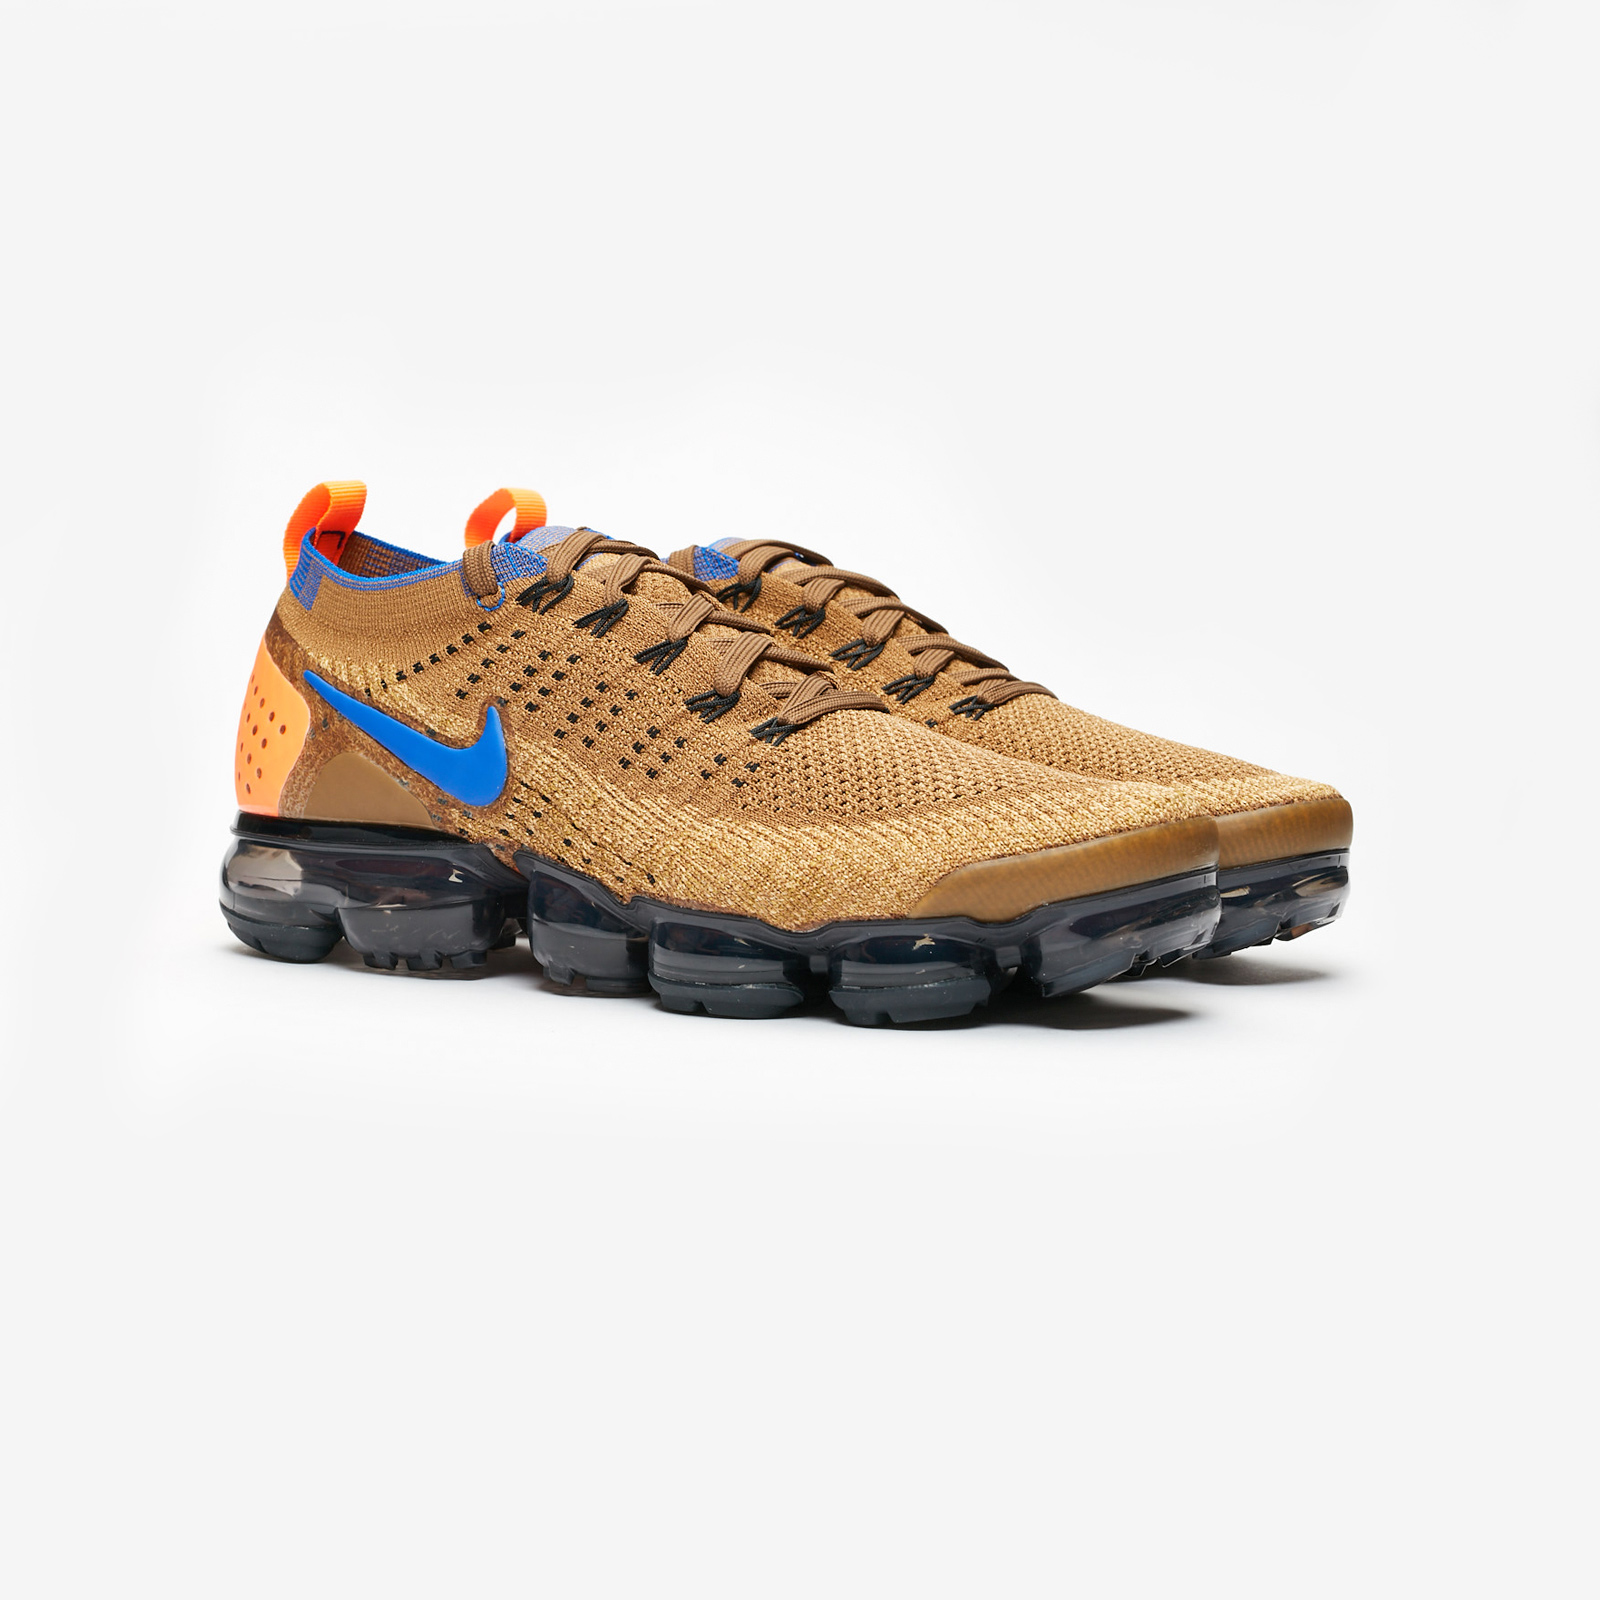 37ab0a0d5c32 Nike Air Vapormax Flyknit 2 - 942842-203 - Sneakersnstuff